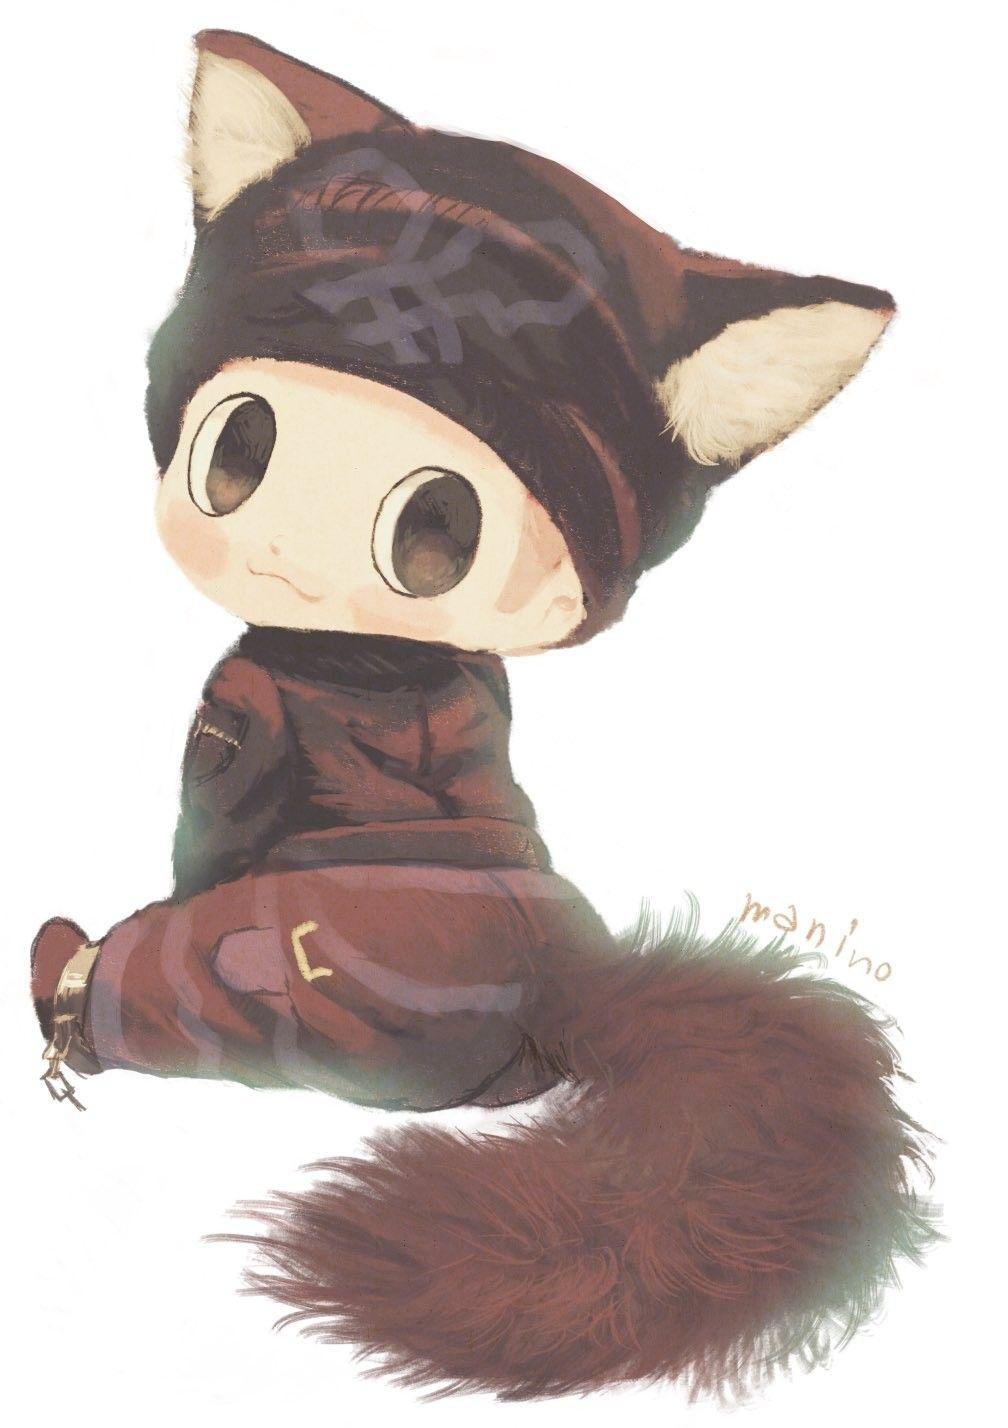 Ryoma Hoshi Danganronpa Anime Favorite Character He belongs to kazutaka kodaka. pinterest